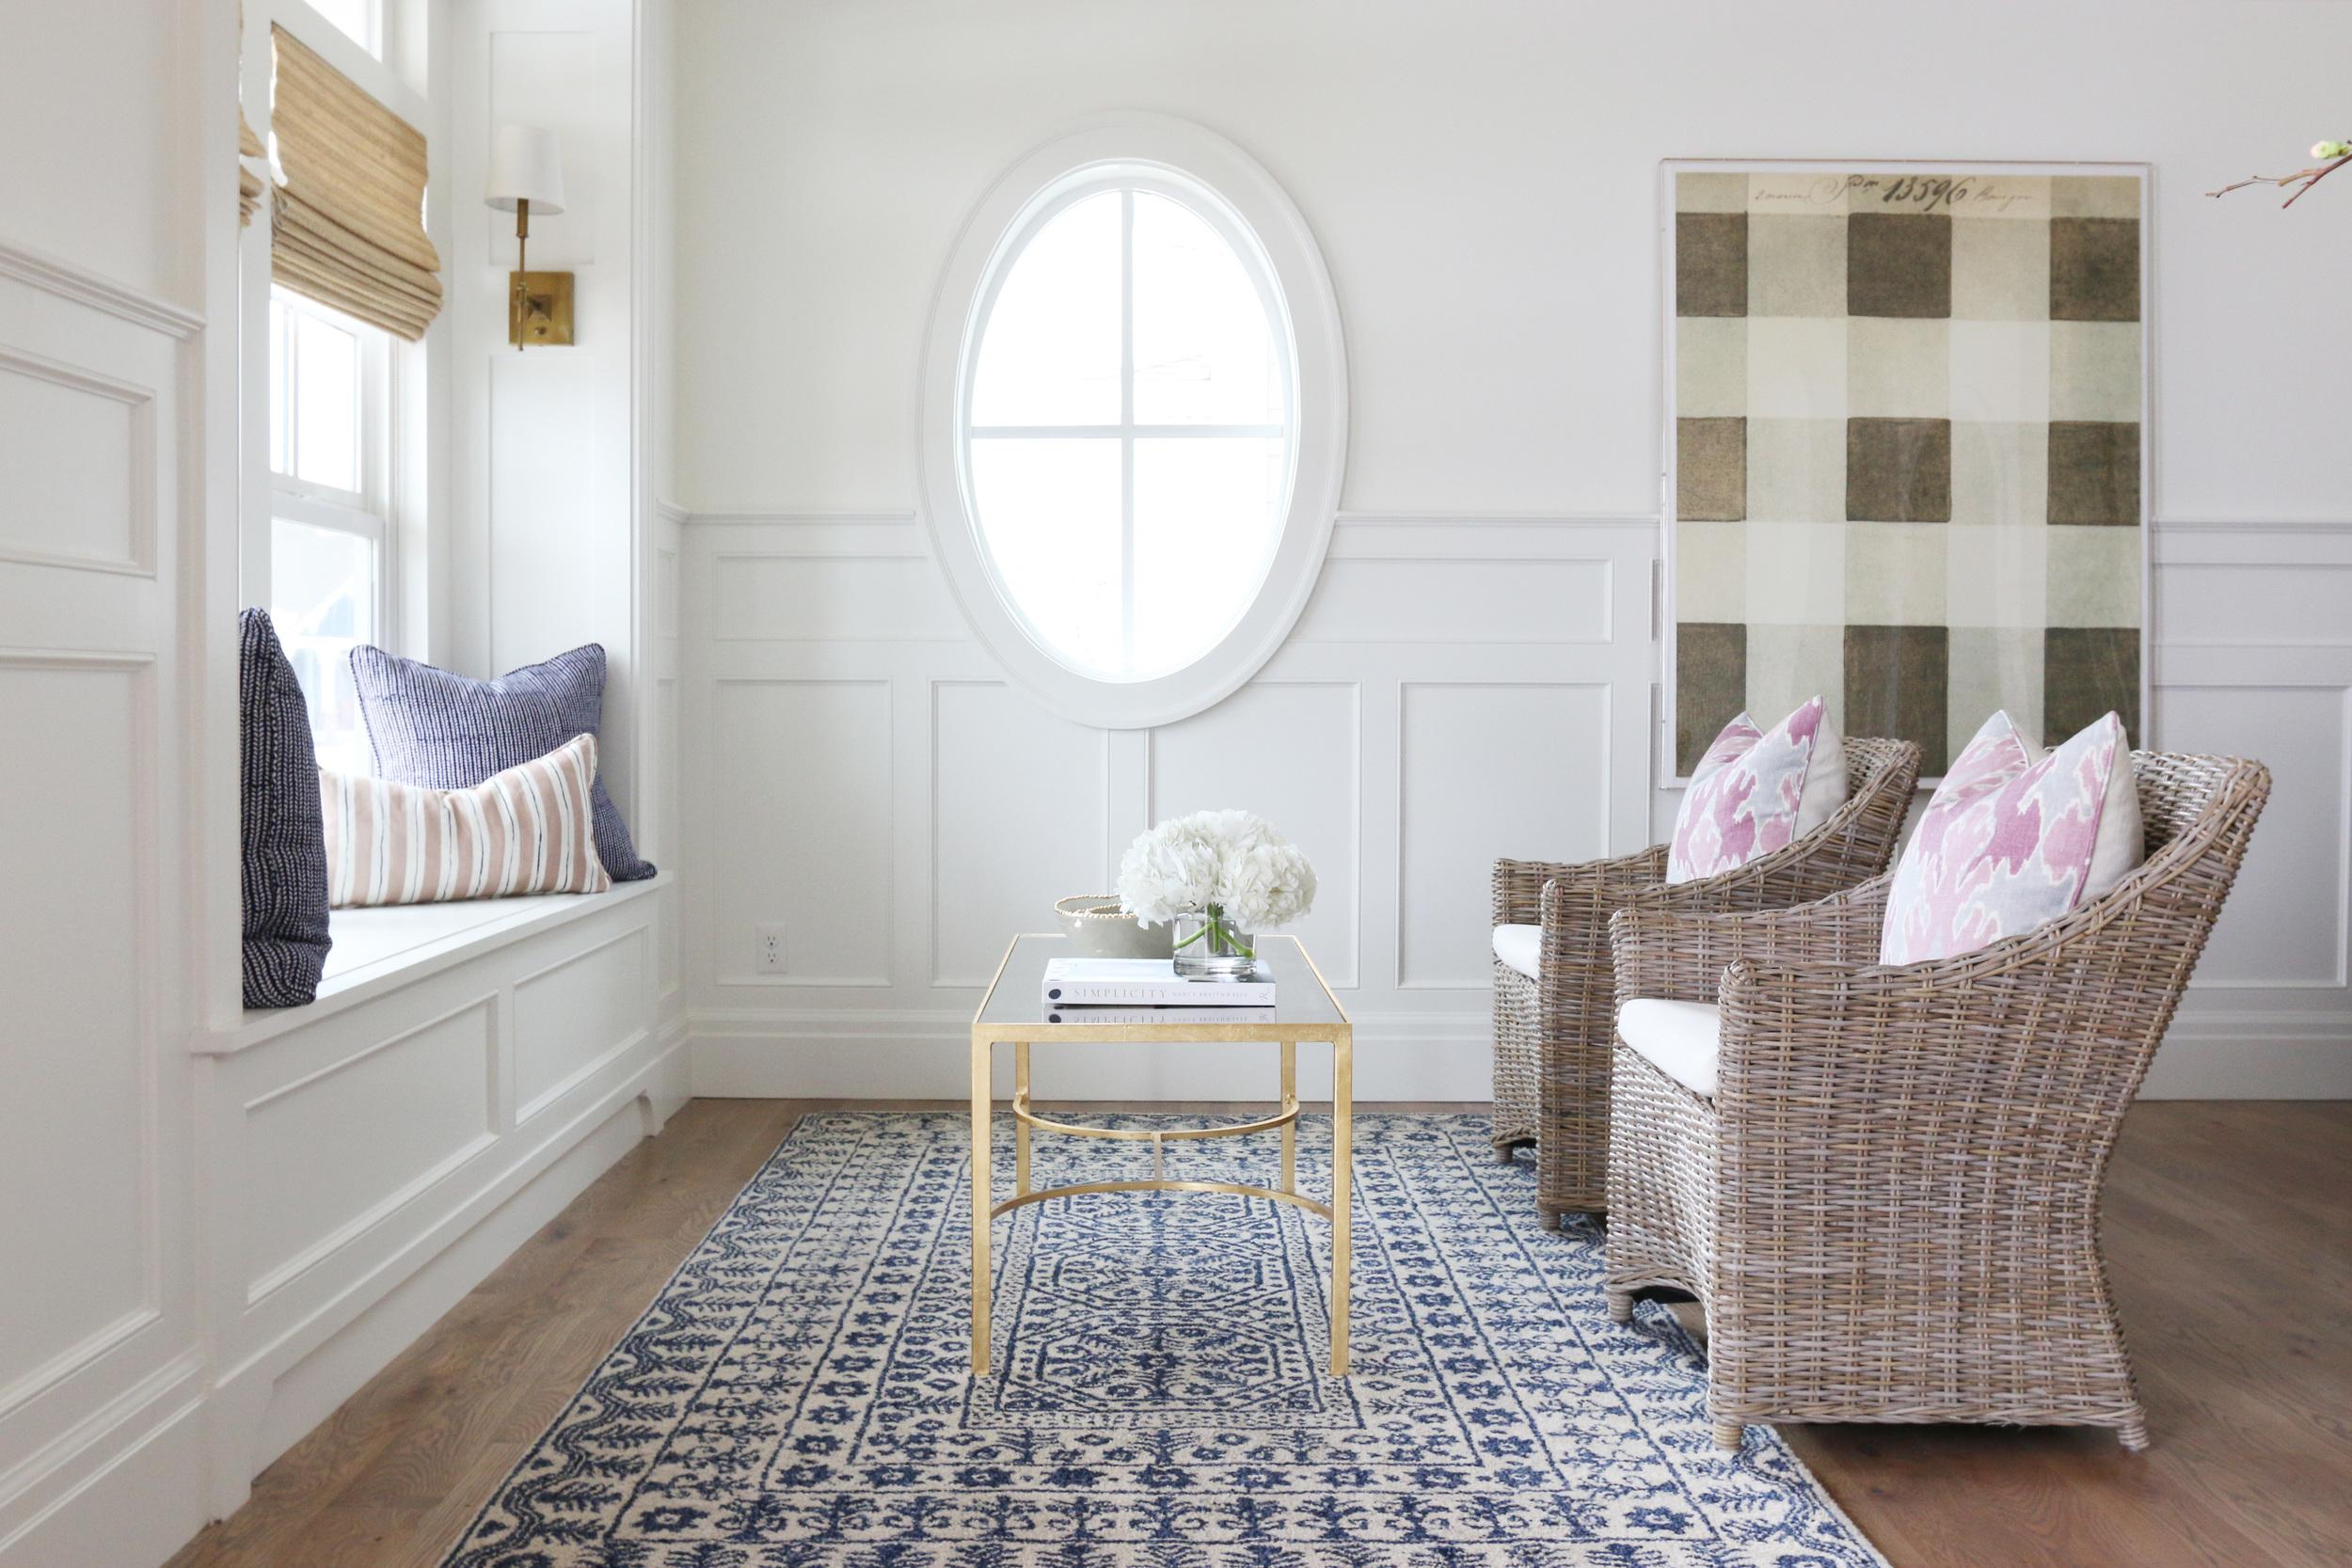 Window Seat and Oval Window || Studio McGee